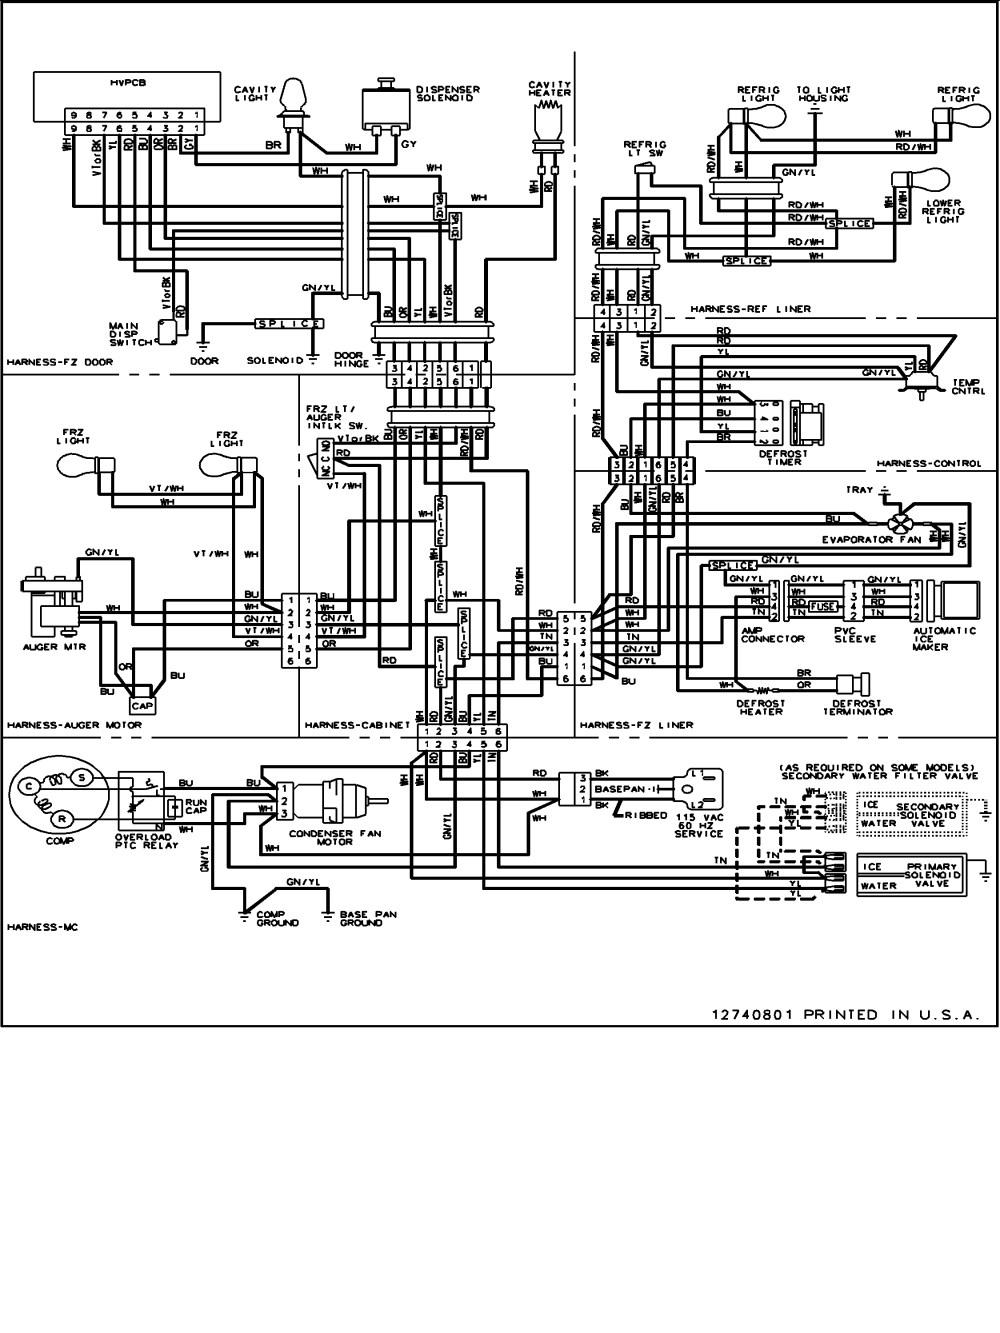 medium resolution of viking professional refrigerator wiring diagram wiring diagram split diagram refrigerator viking wiring vcsb483dbk